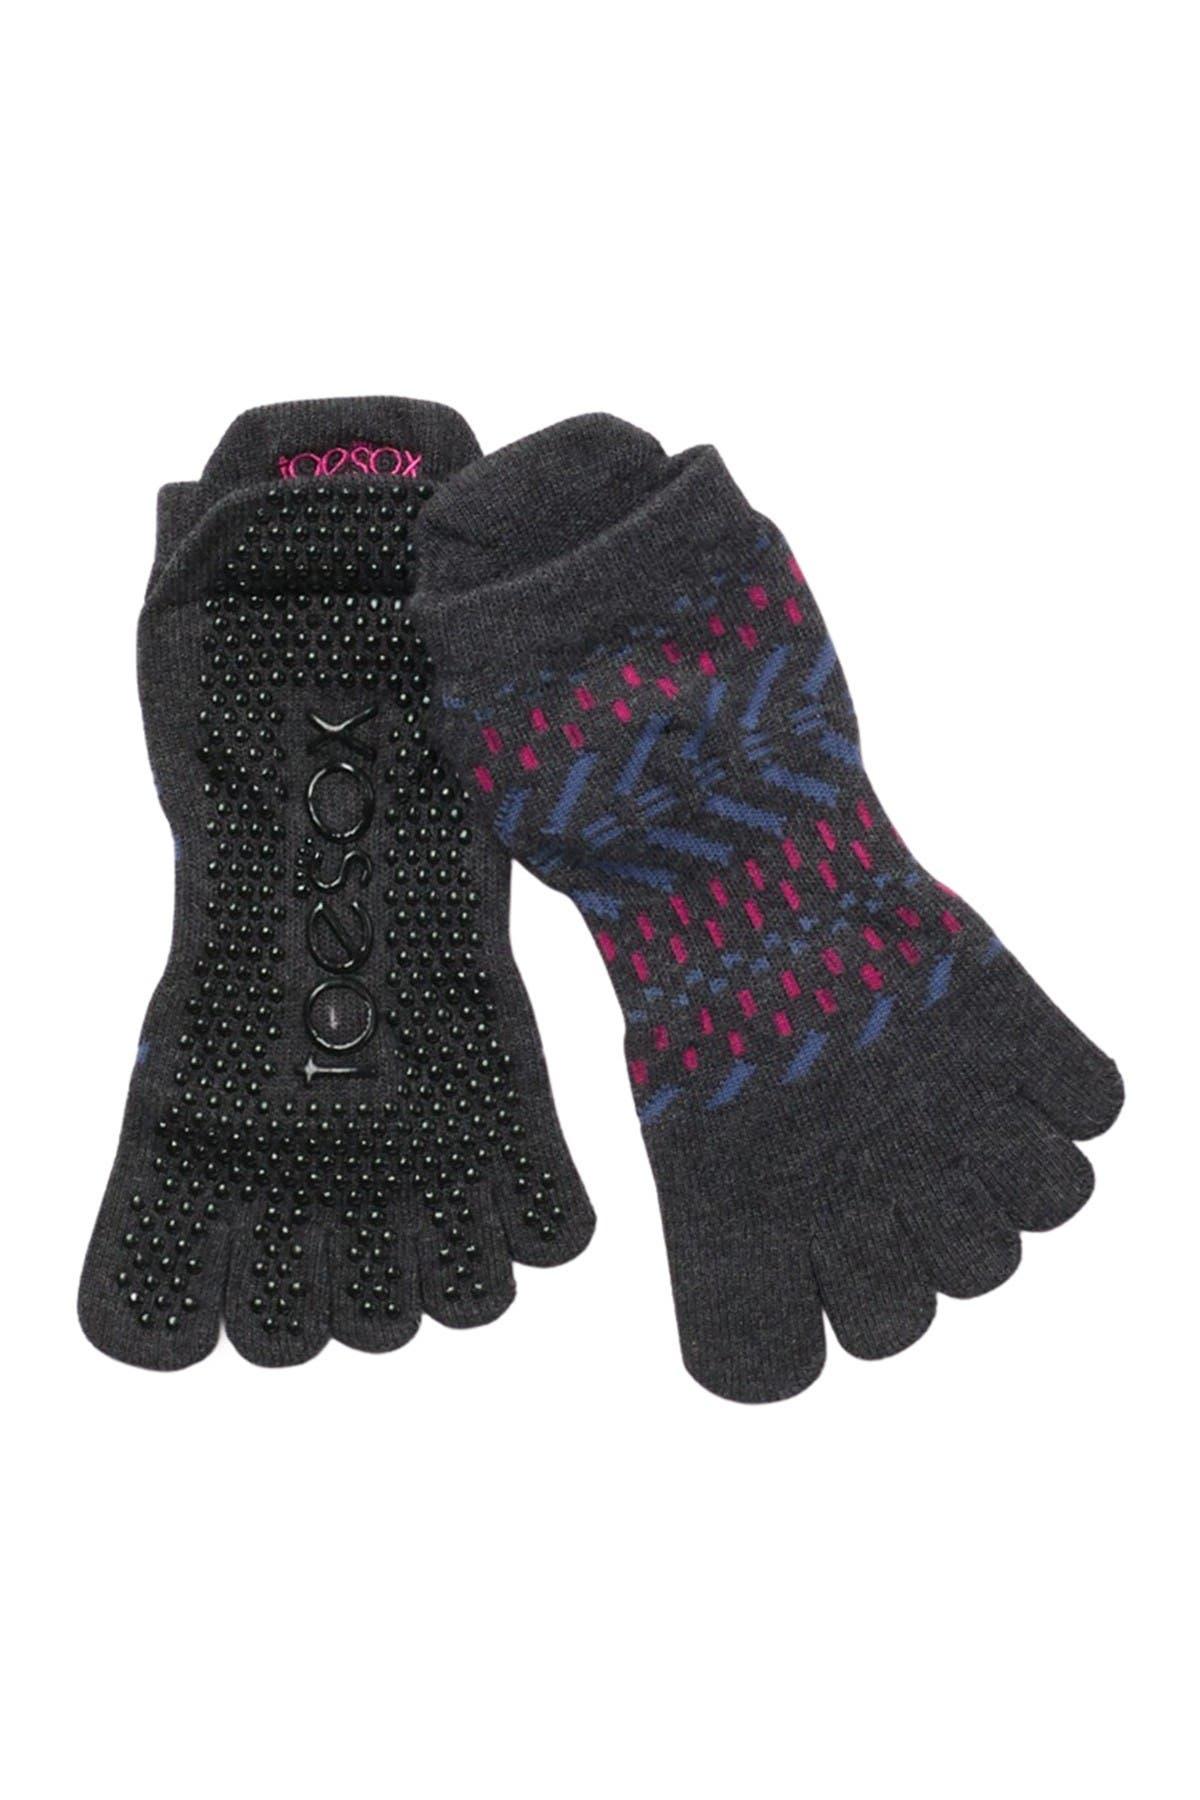 Image of ToeSox Full Toe Low Rise Grip Socks